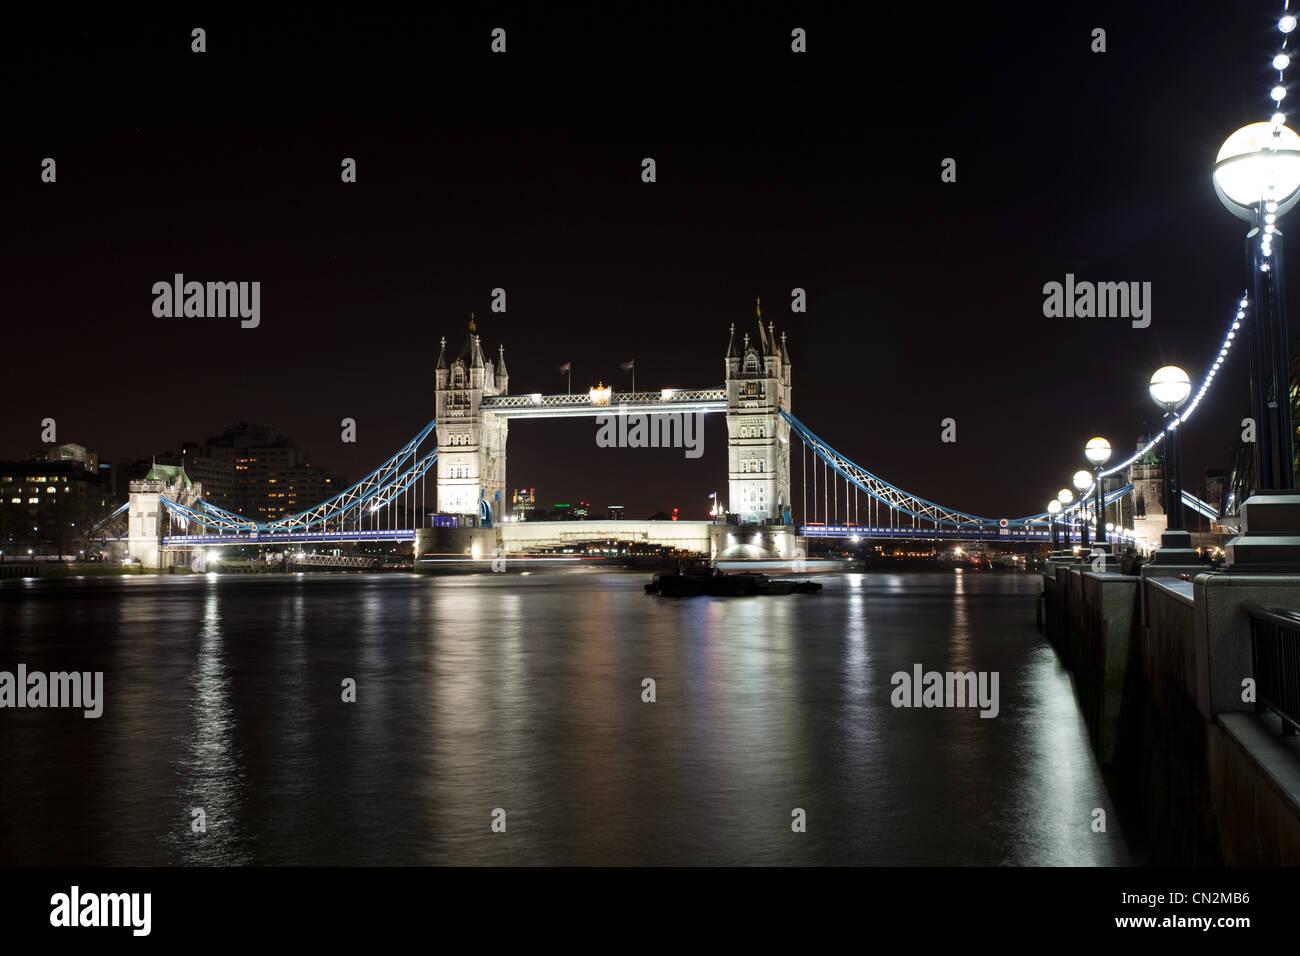 Tower Bridge over River Thames, London, UK - Stock Image